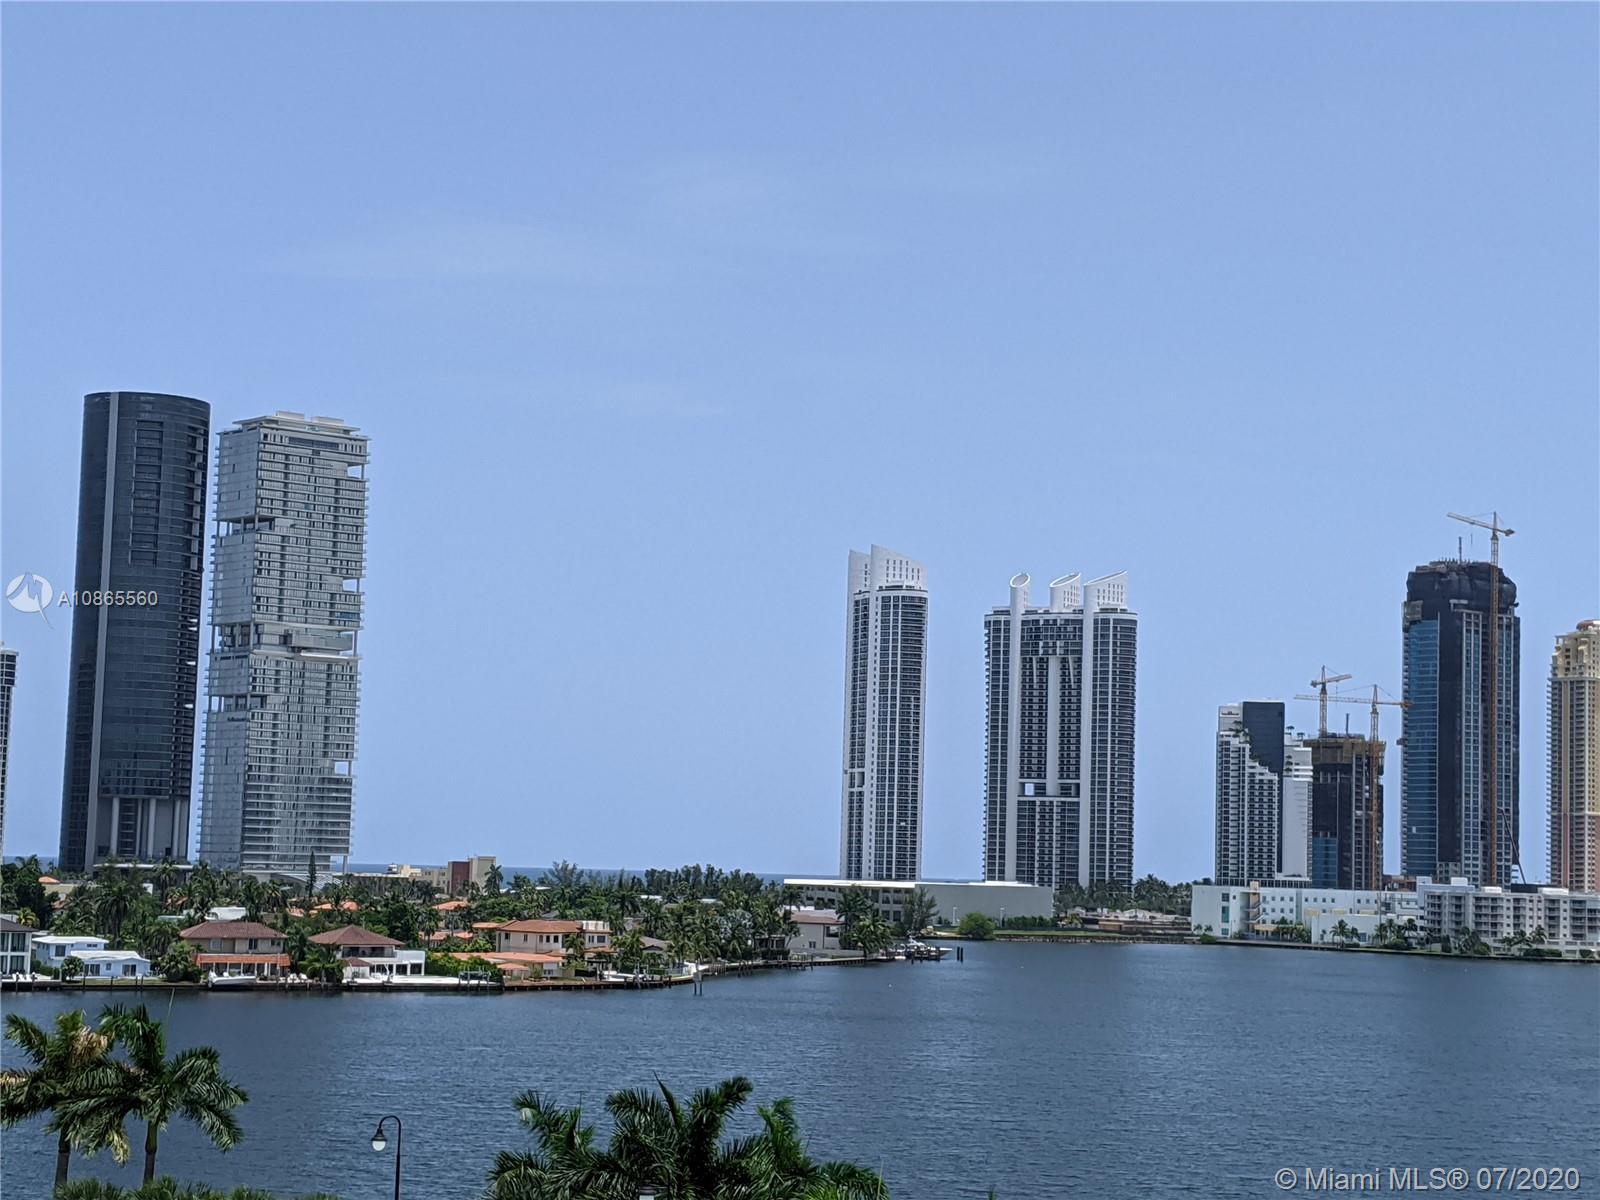 Mystic Pointe Tower 500 #813 - 3530 Mystic Pointe Dr #813, Aventura, FL 33180